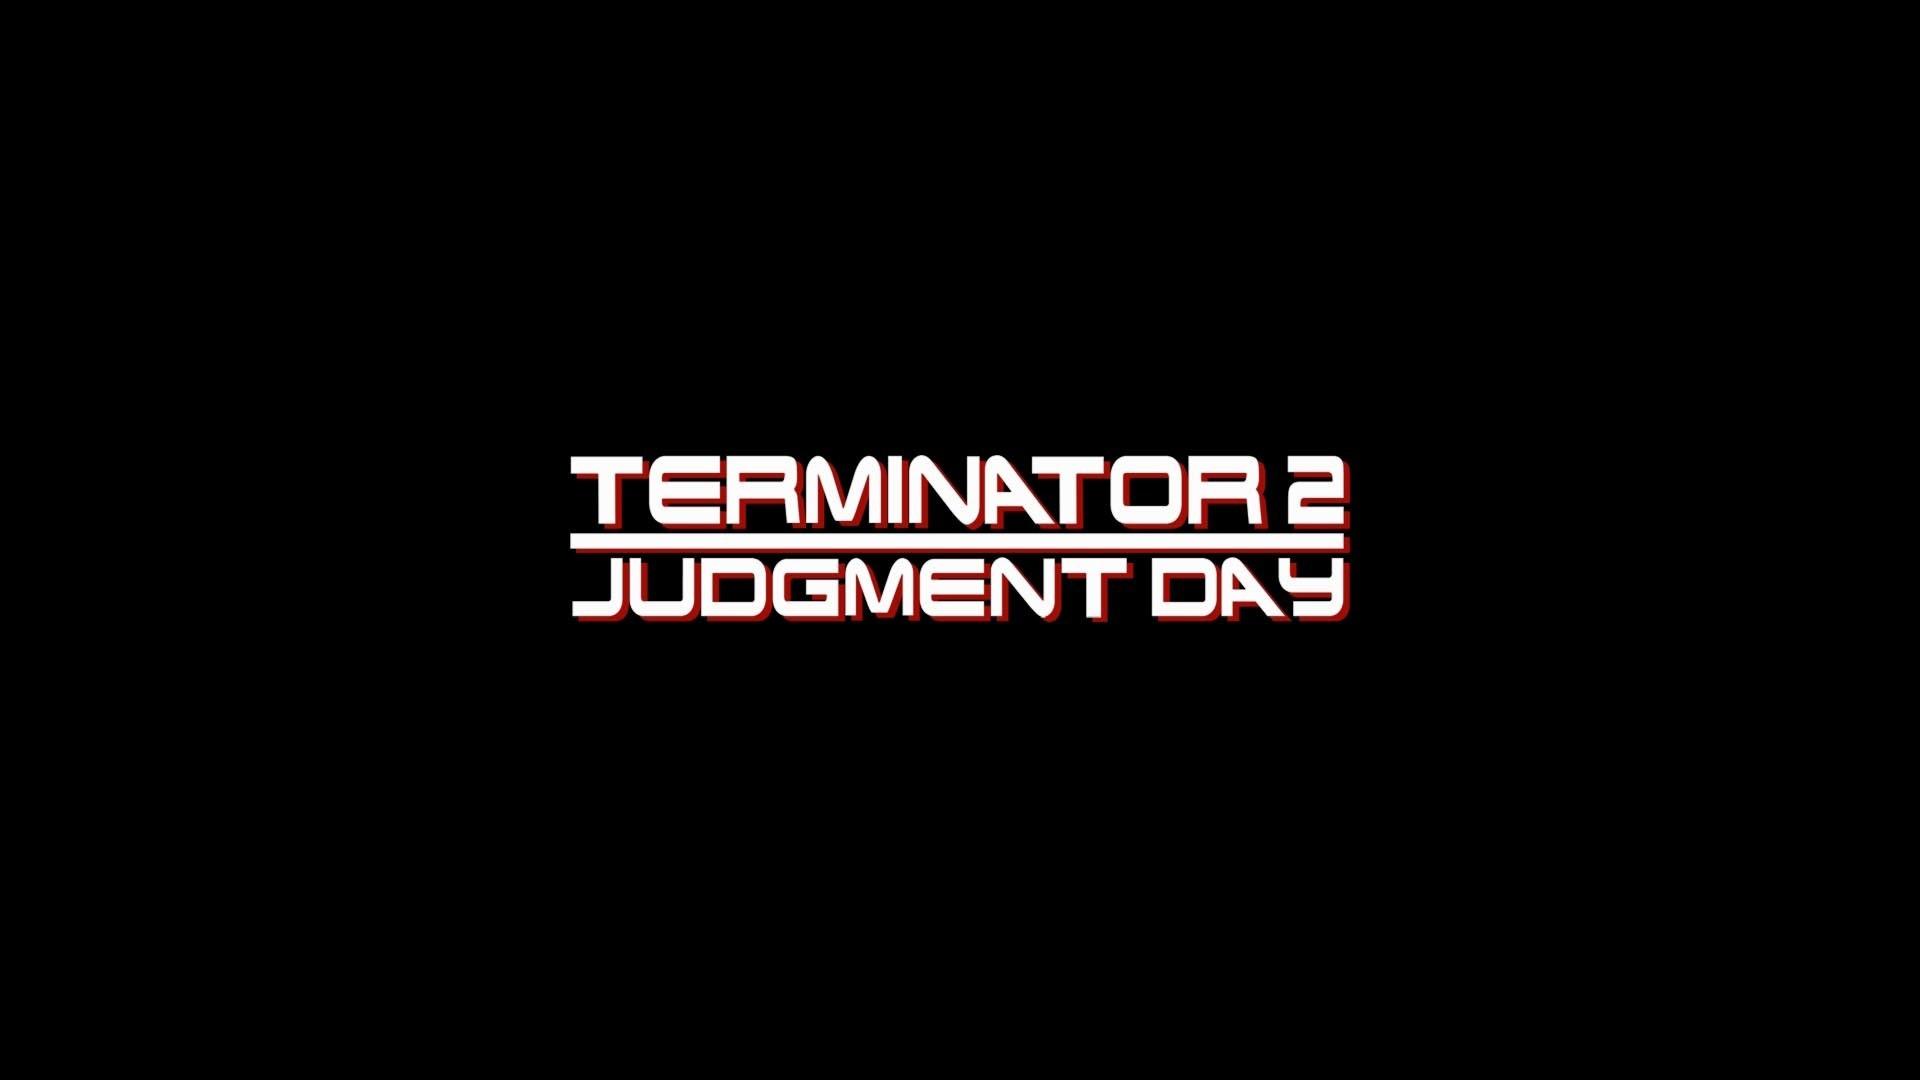 Res: 1920x1080, Terminator 2: Judgment Day HD Wallpaper